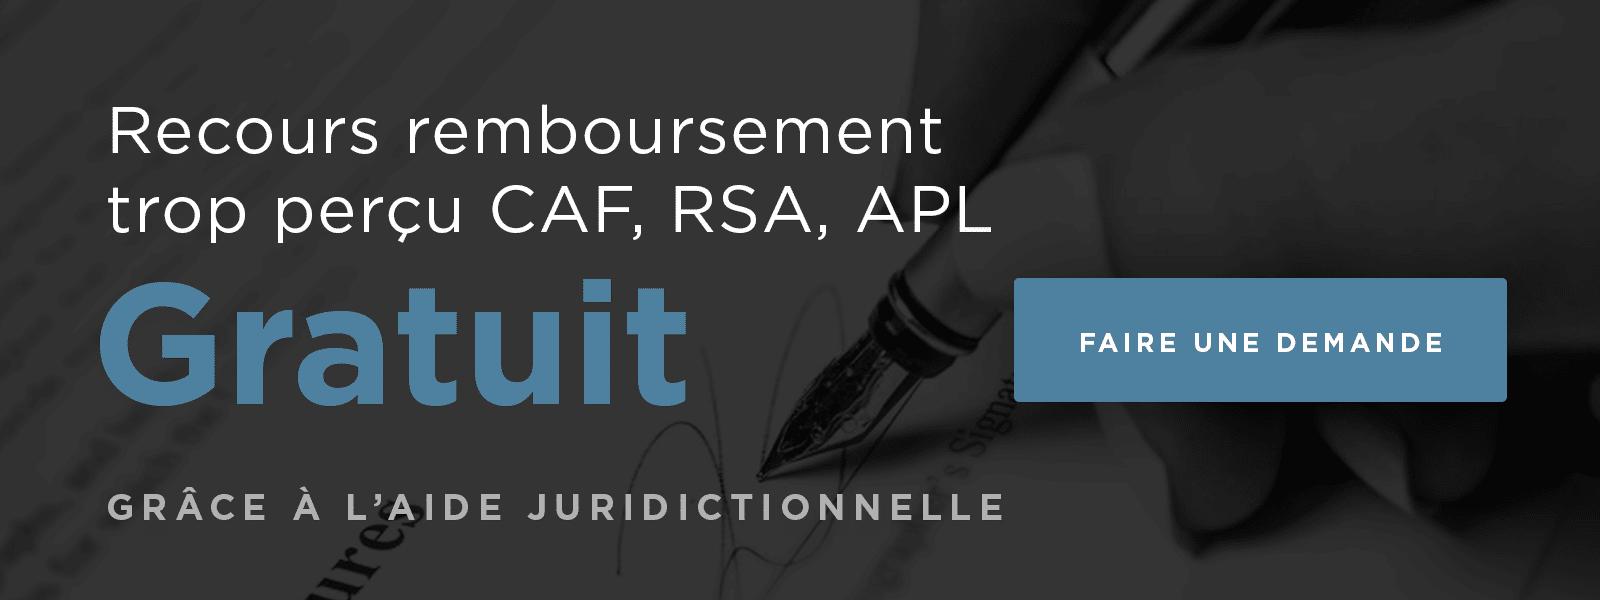 CAF-RSA-APL-ALS-Remboursement-Trop-Percu-Recours-Tribunal-Administratif